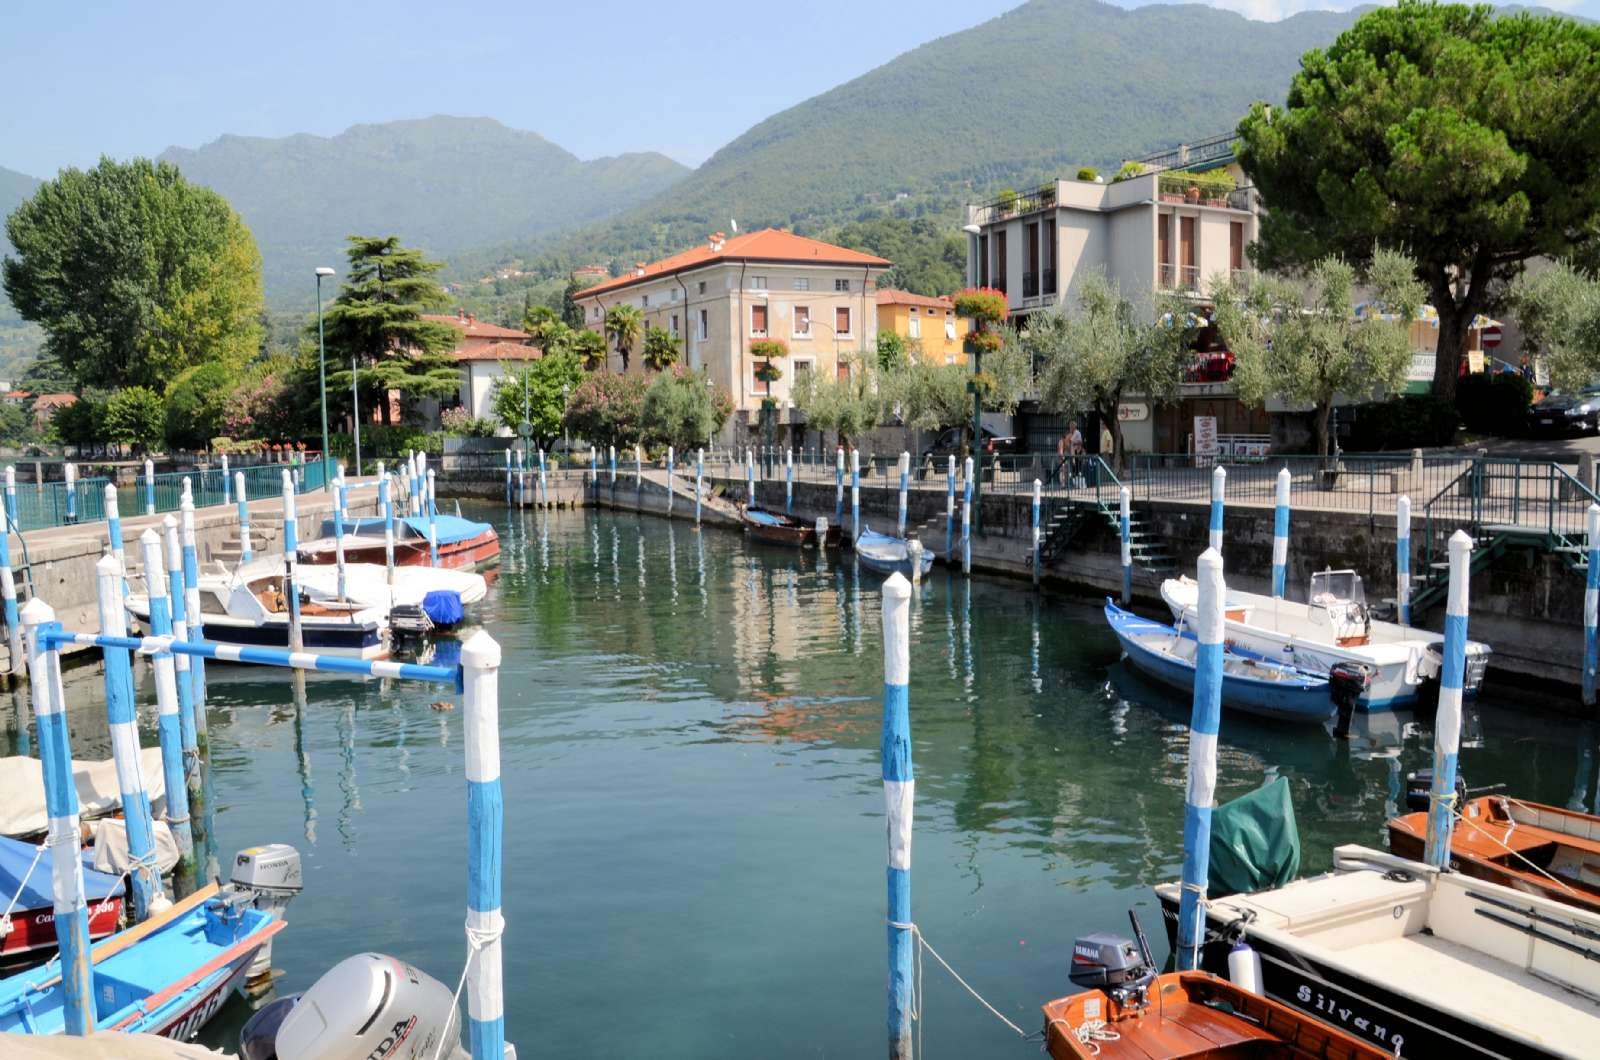 Sulzanos lystbådehavn